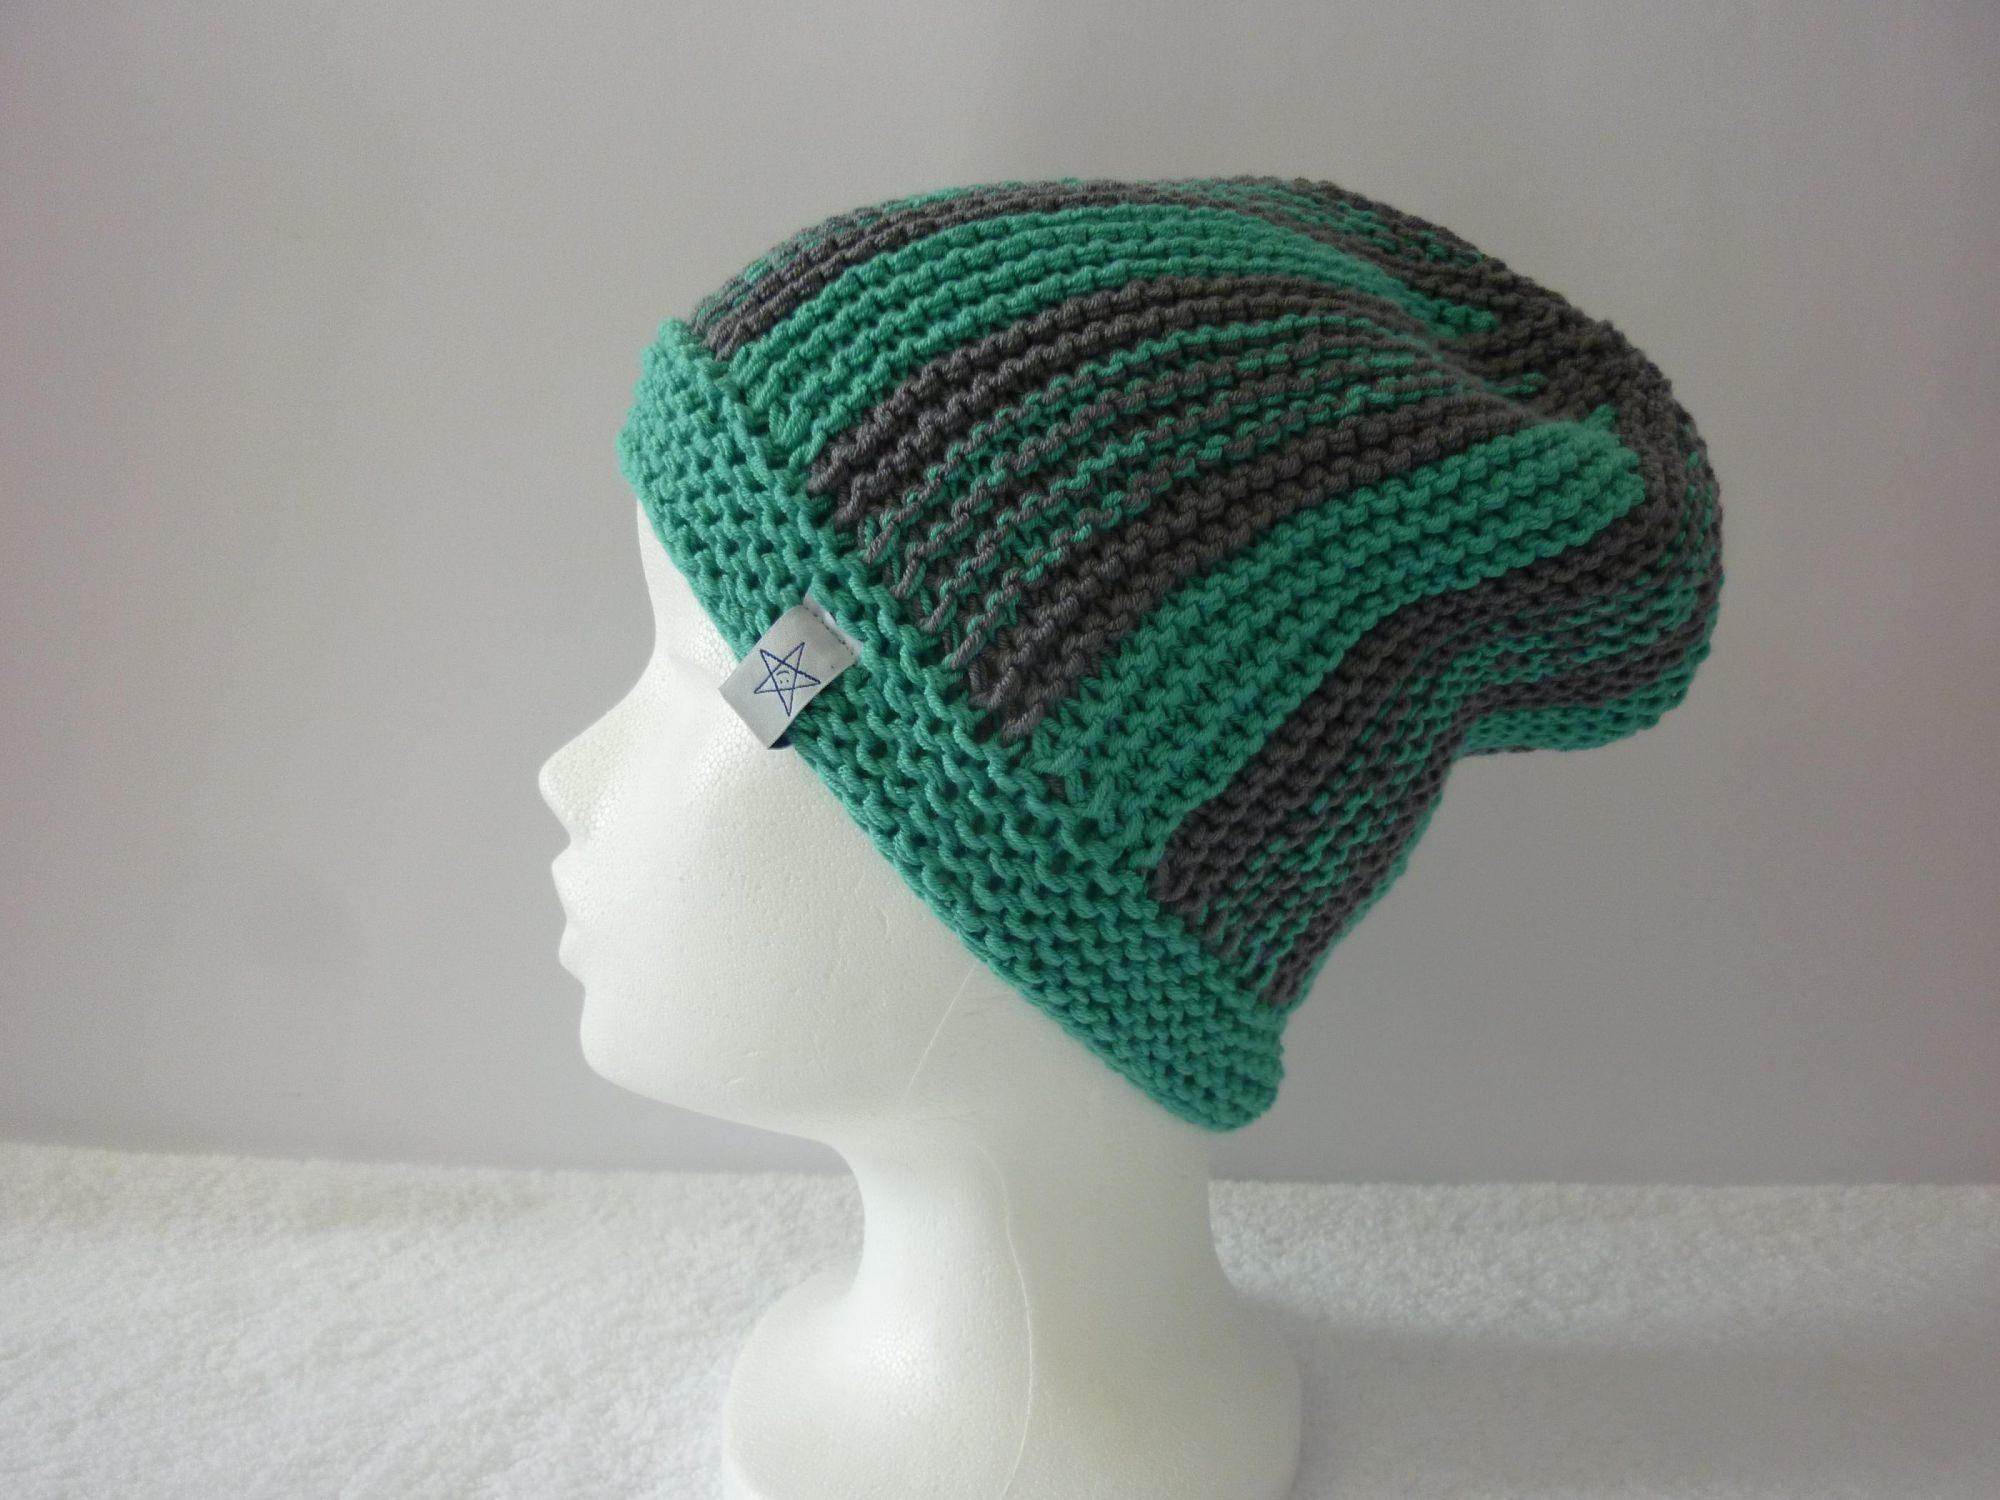 - Strickmütze grüntürkis und grau aus Baumwolle handgestrickt - Strickmütze grüntürkis und grau aus Baumwolle handgestrickt